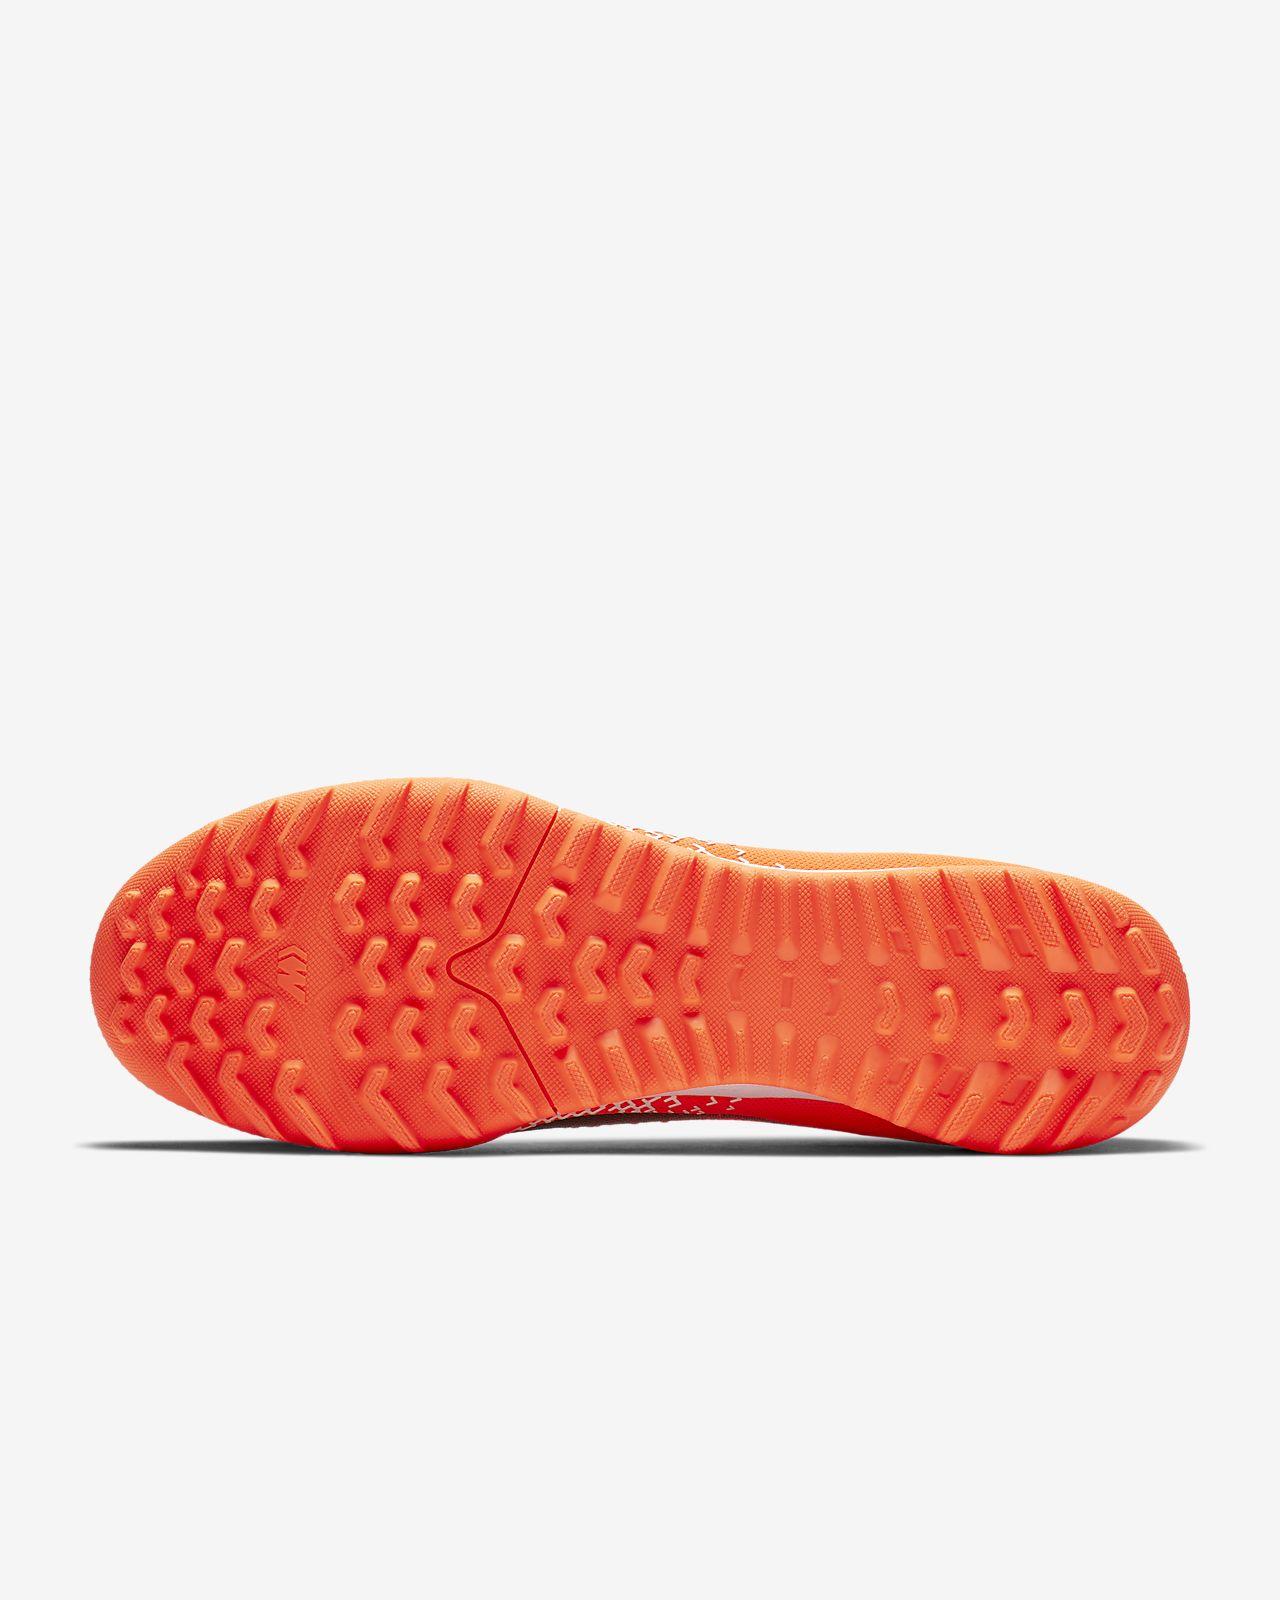 7f874382d69 Nike MercurialX Vapor XII Pro TF Turf Football Shoe. Nike.com CA